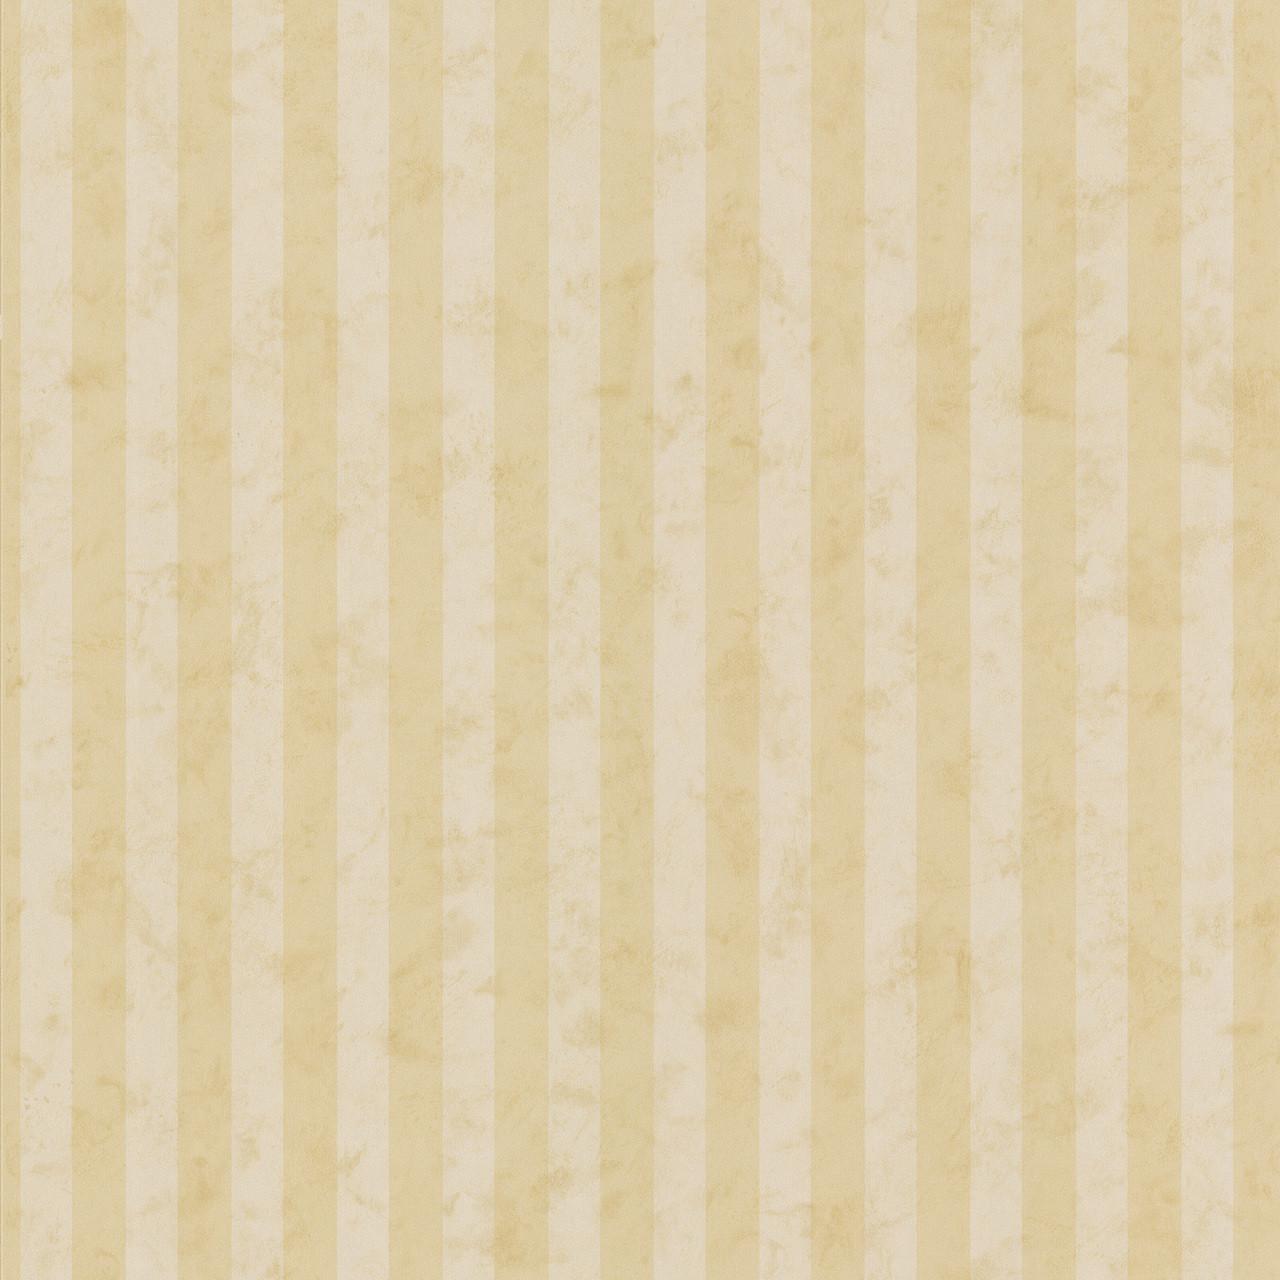 436 45106 Estella Mustard Textured Stripe Wallpaper